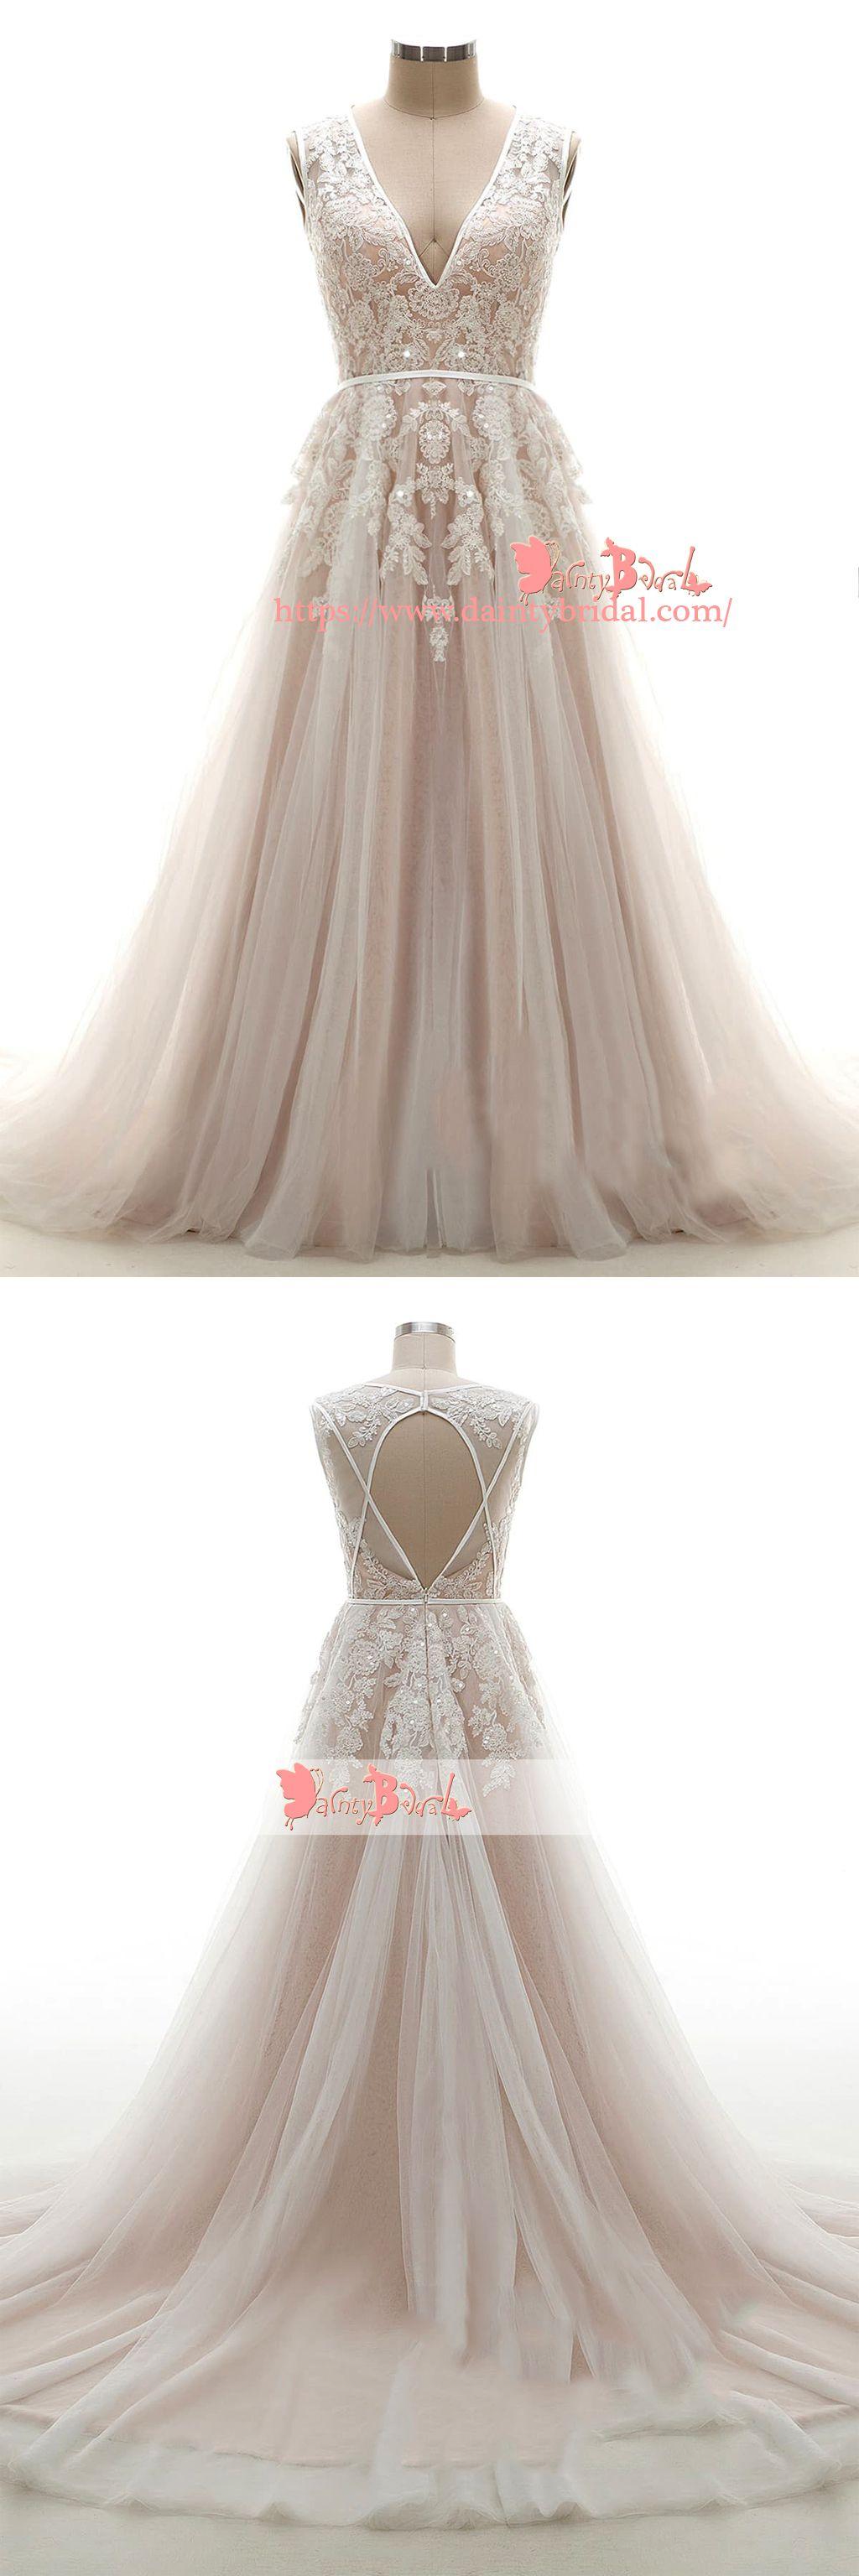 Light nude open back vneck appliques wedding dressesdb